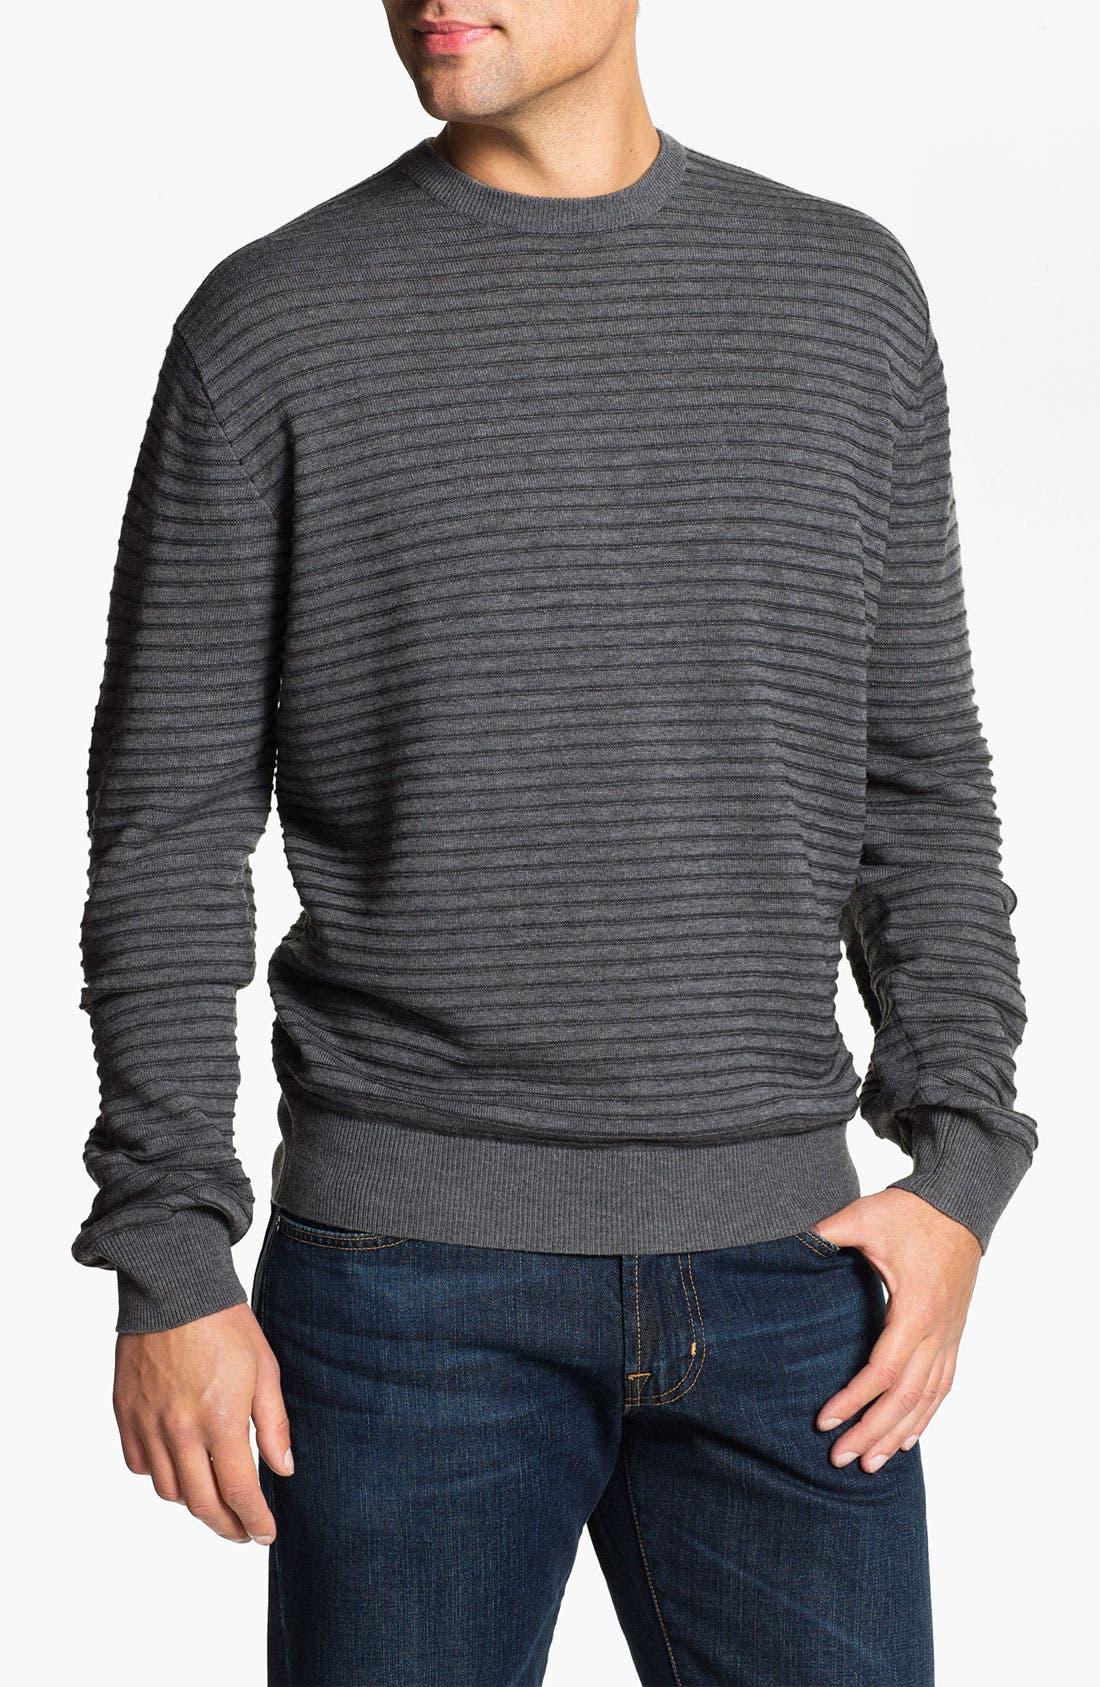 Main Image - Toscano Merino Wool Blend Crewneck Sweater